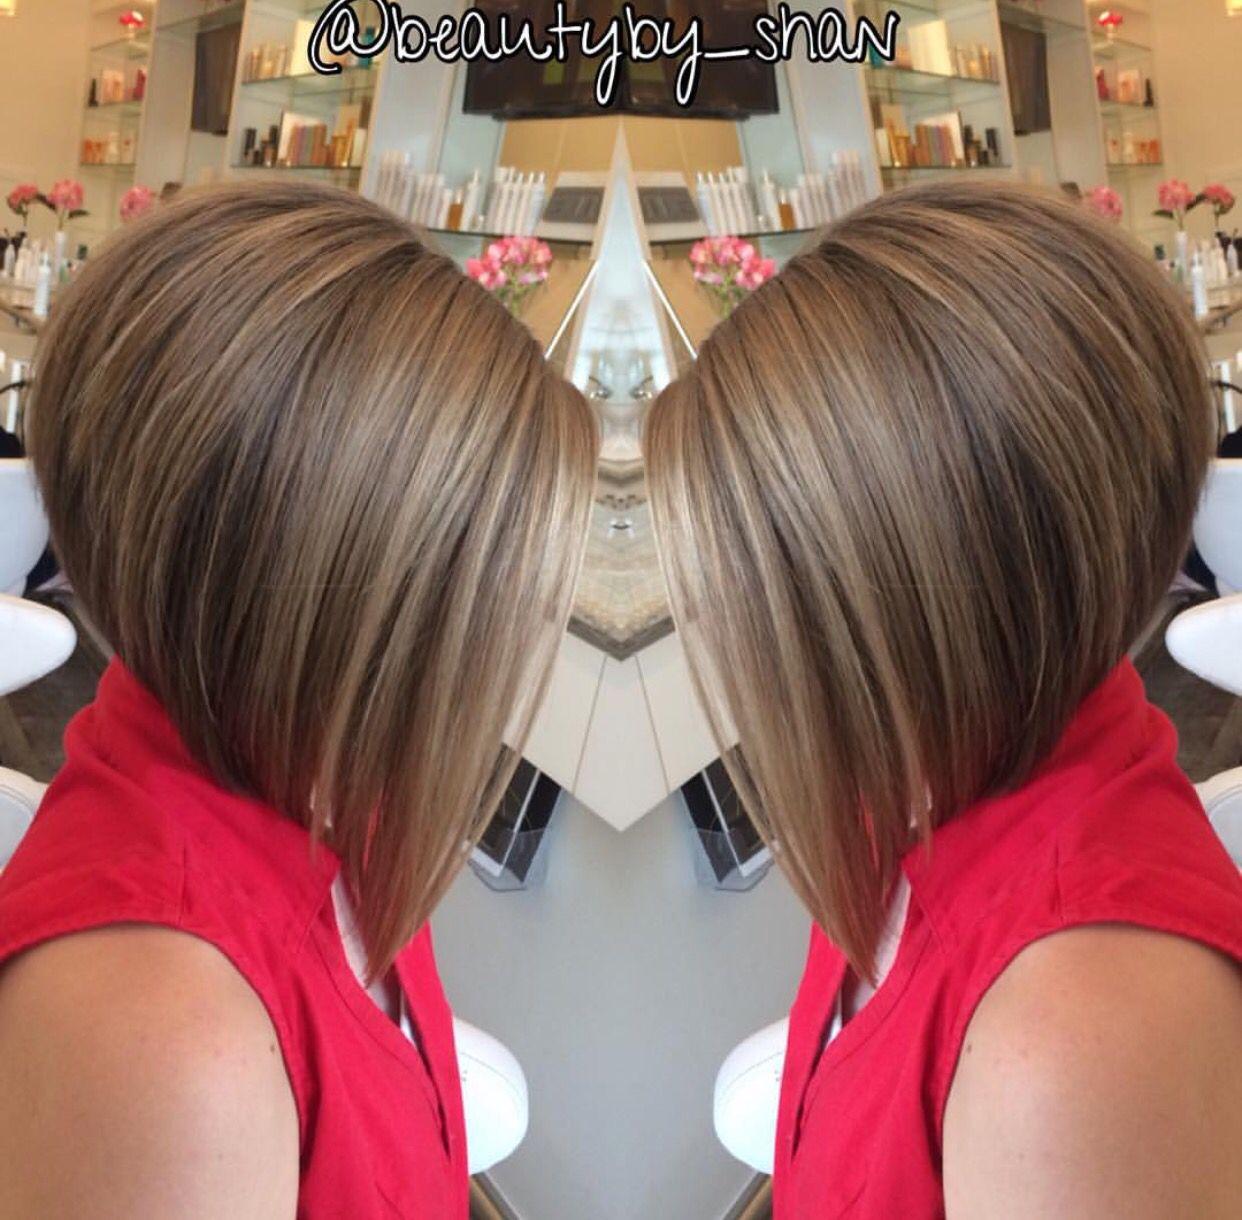 how to cut long hair short